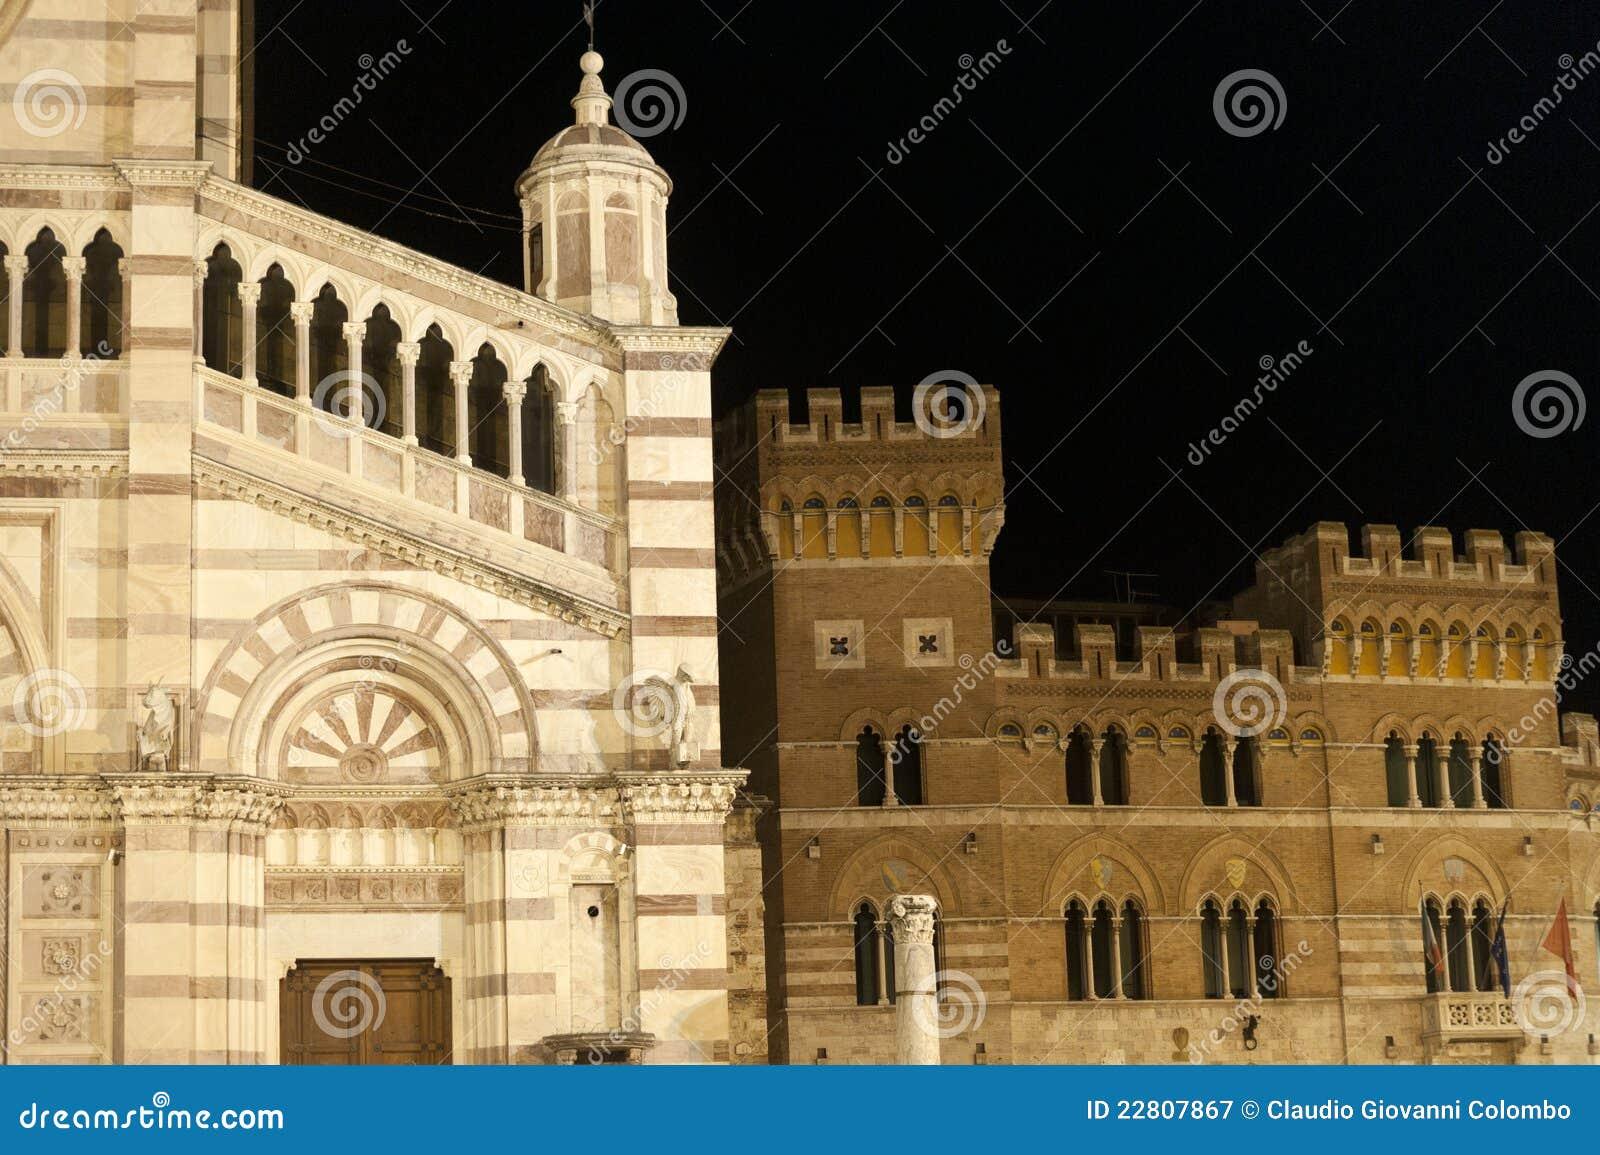 Duomodi Grosseto und Palast